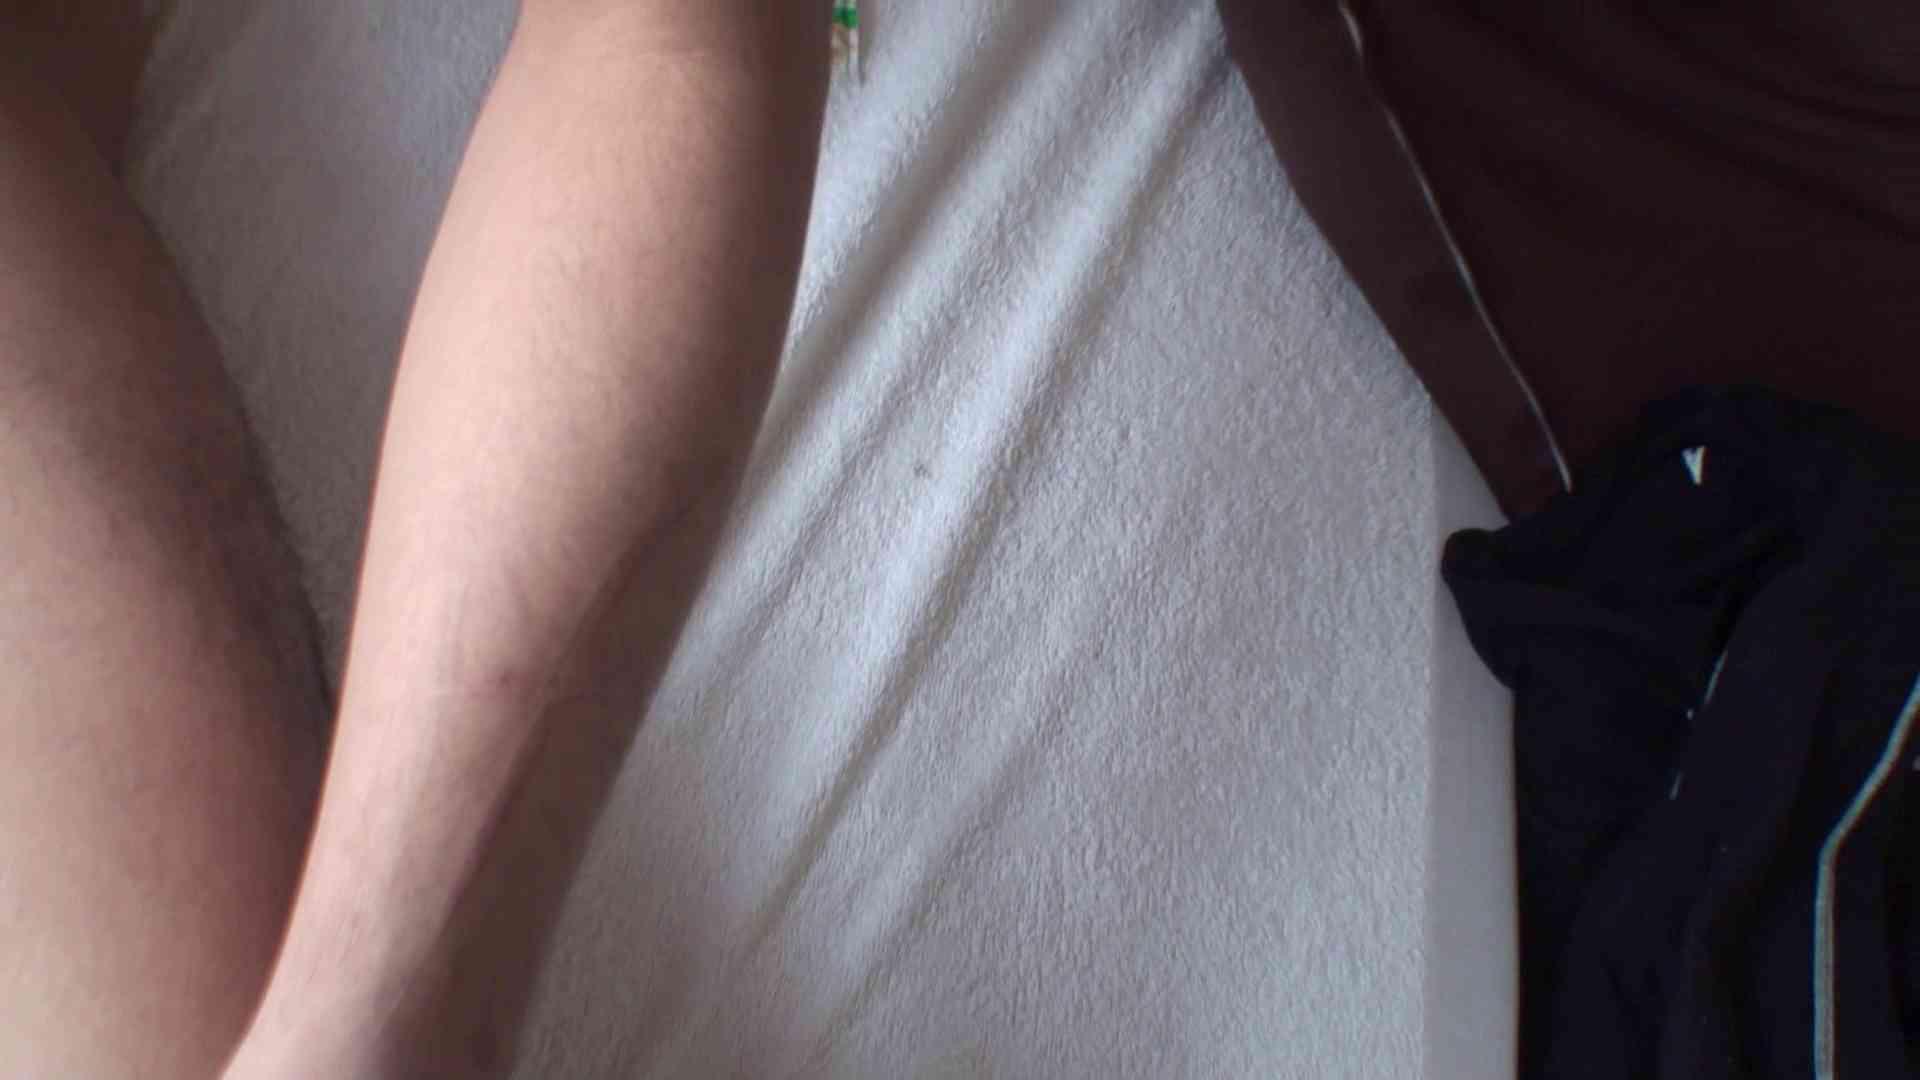 HD 良太と健二当たり前の日常 セックス編 巨根系男子  65枚 30